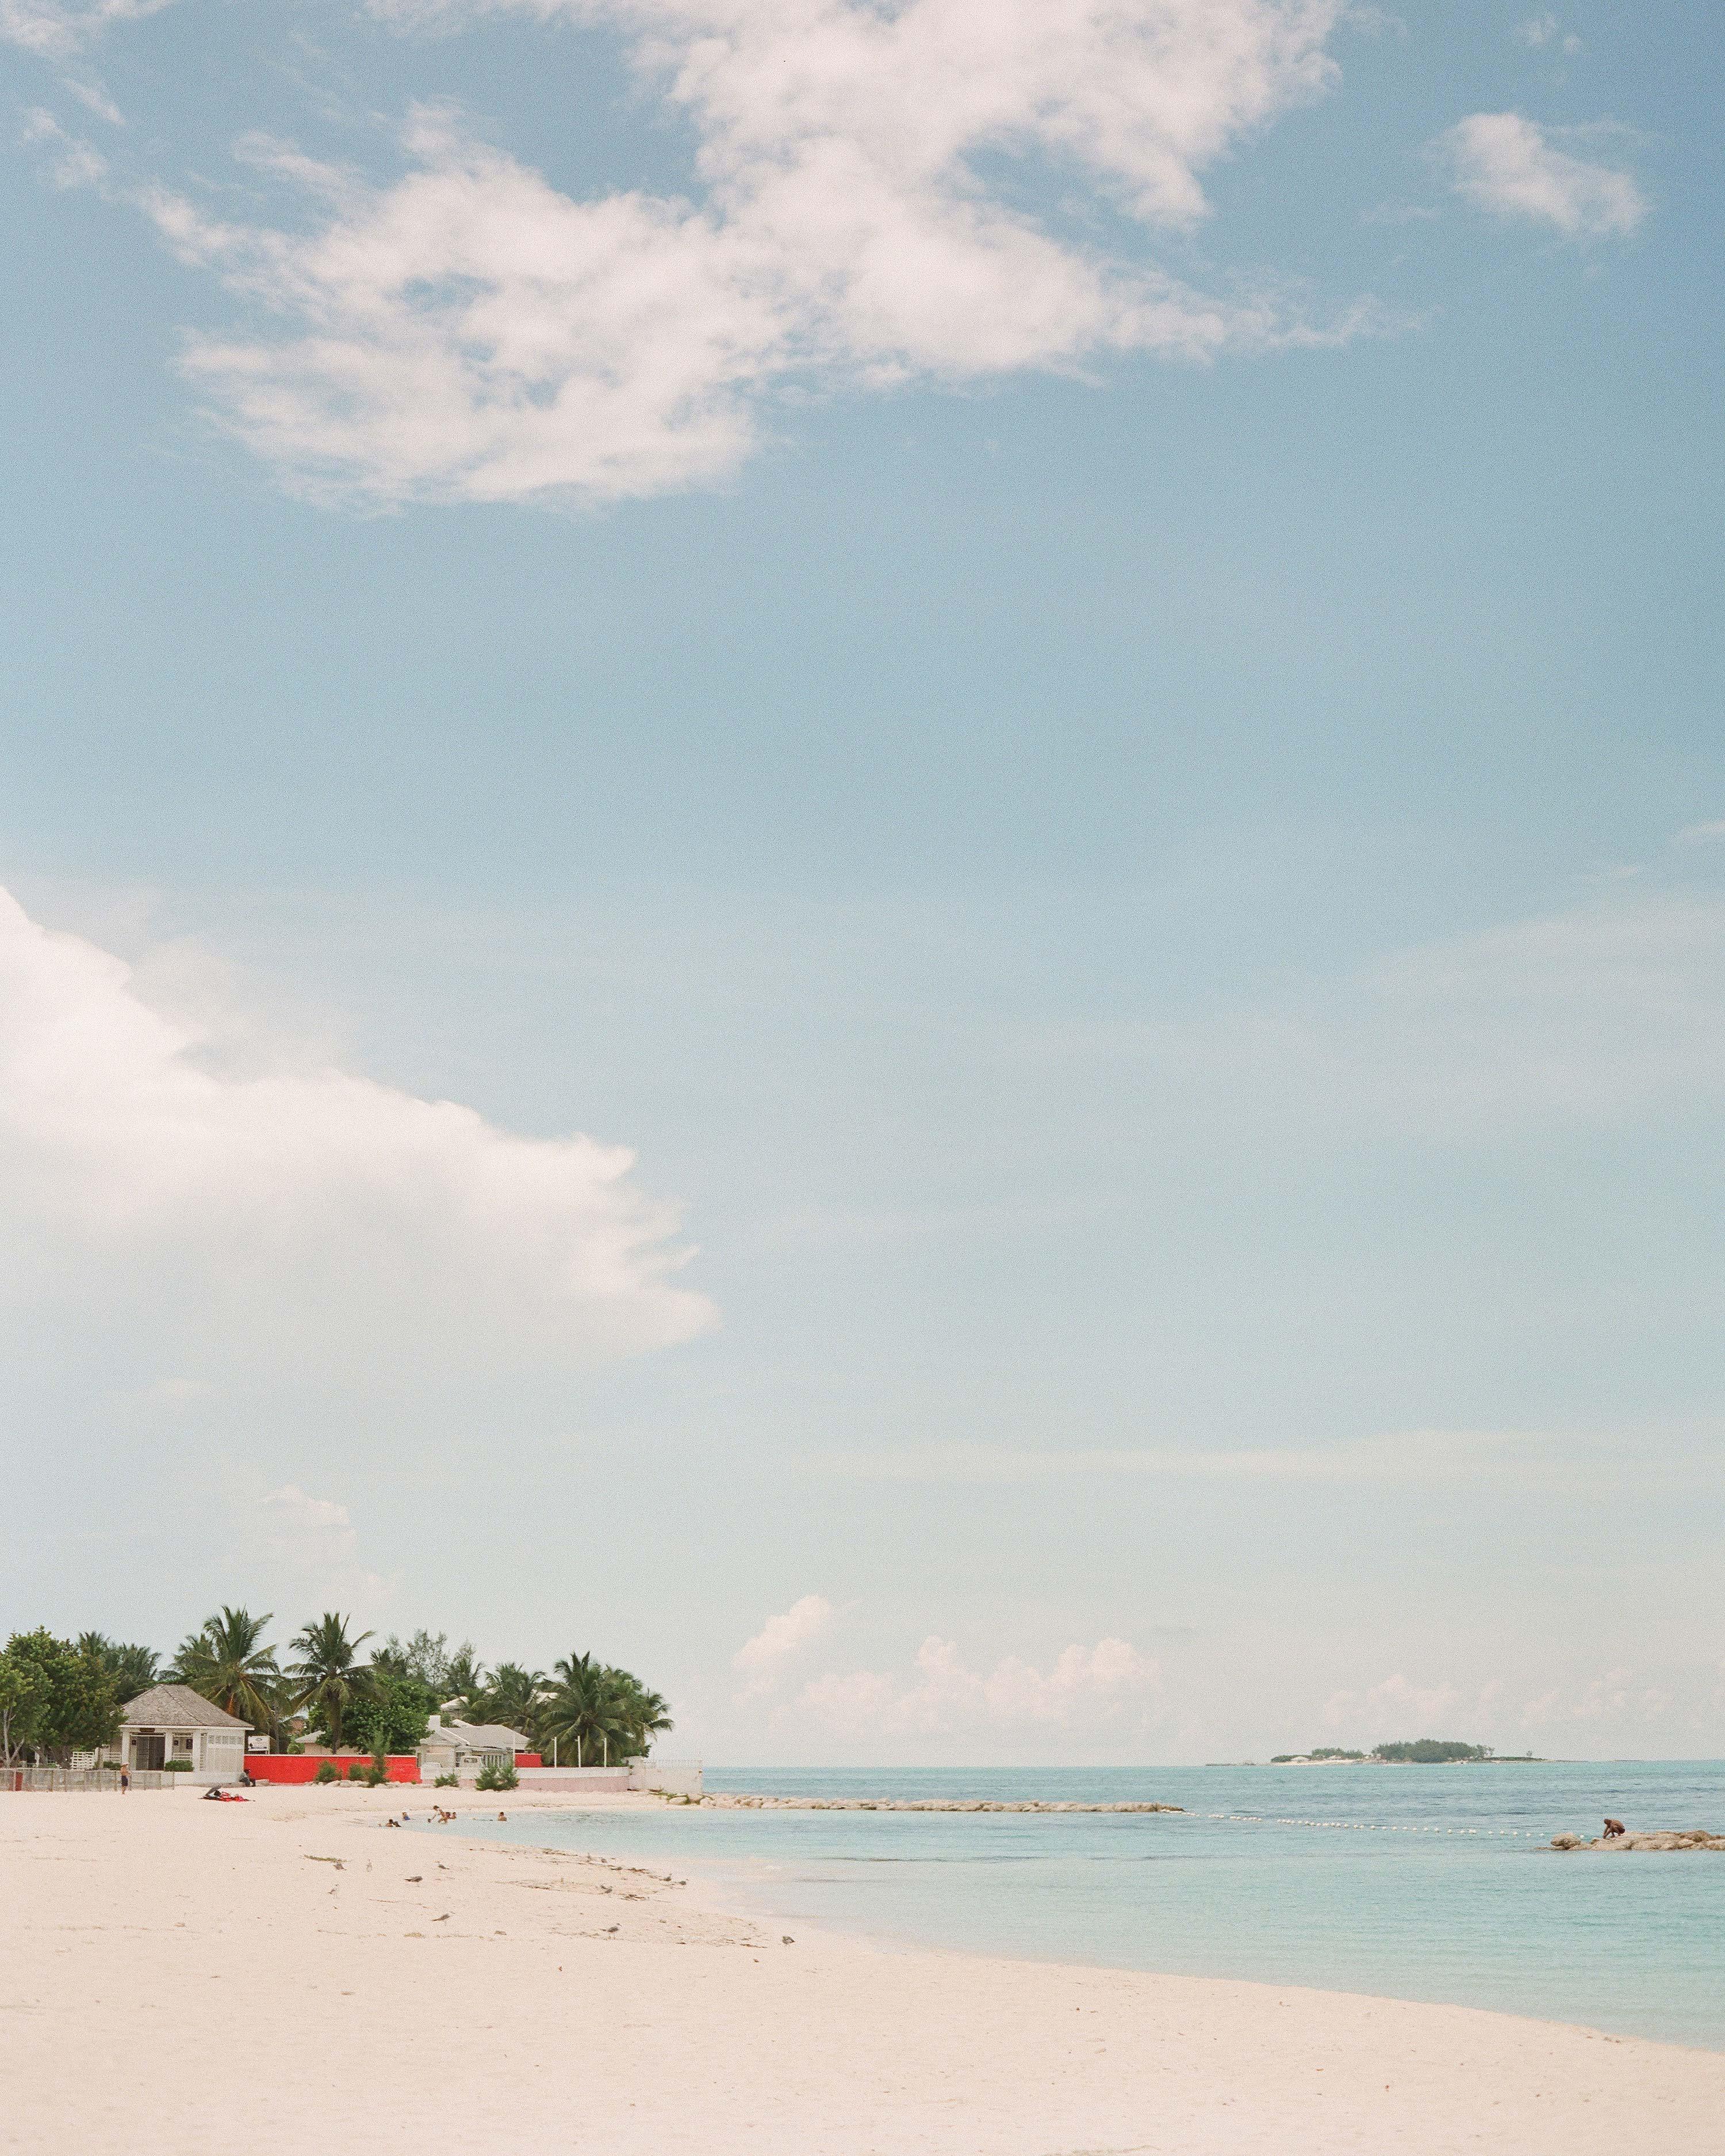 kelsey-casey-wedding-bahamas-beach-0011-1788-s112804.jpg